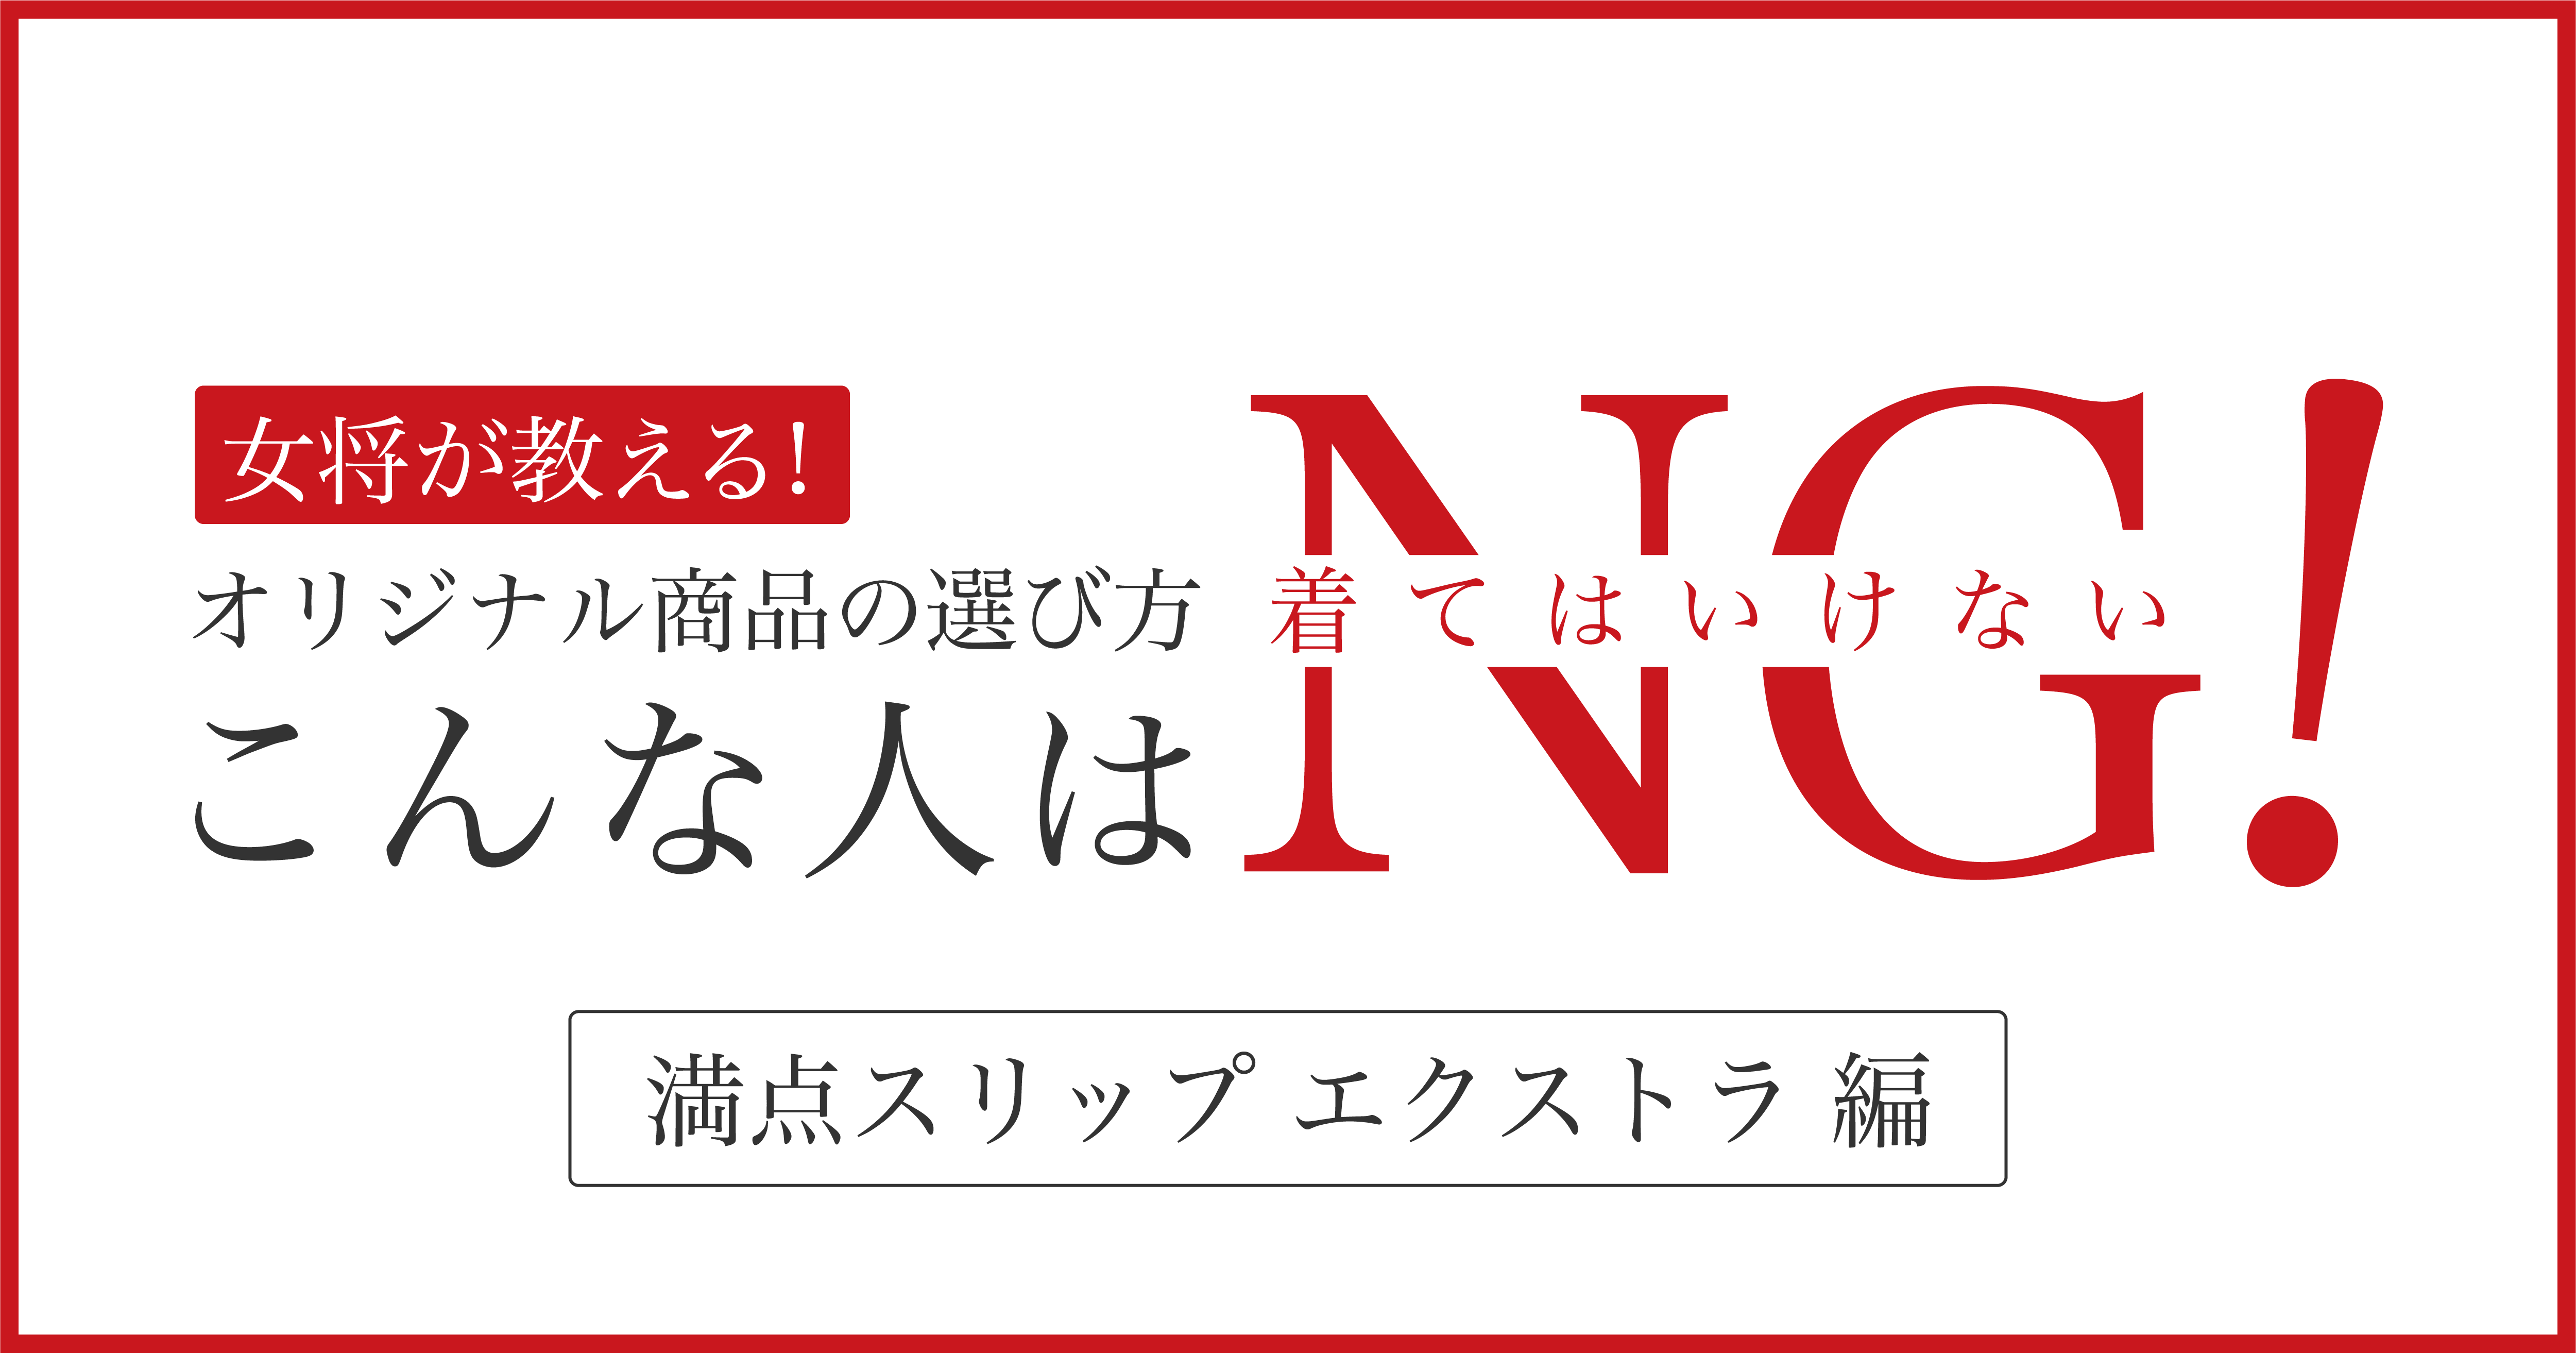 https://k-takahasi.com/ja/wp-content/uploads/2020/02/b_okami_vol5.png